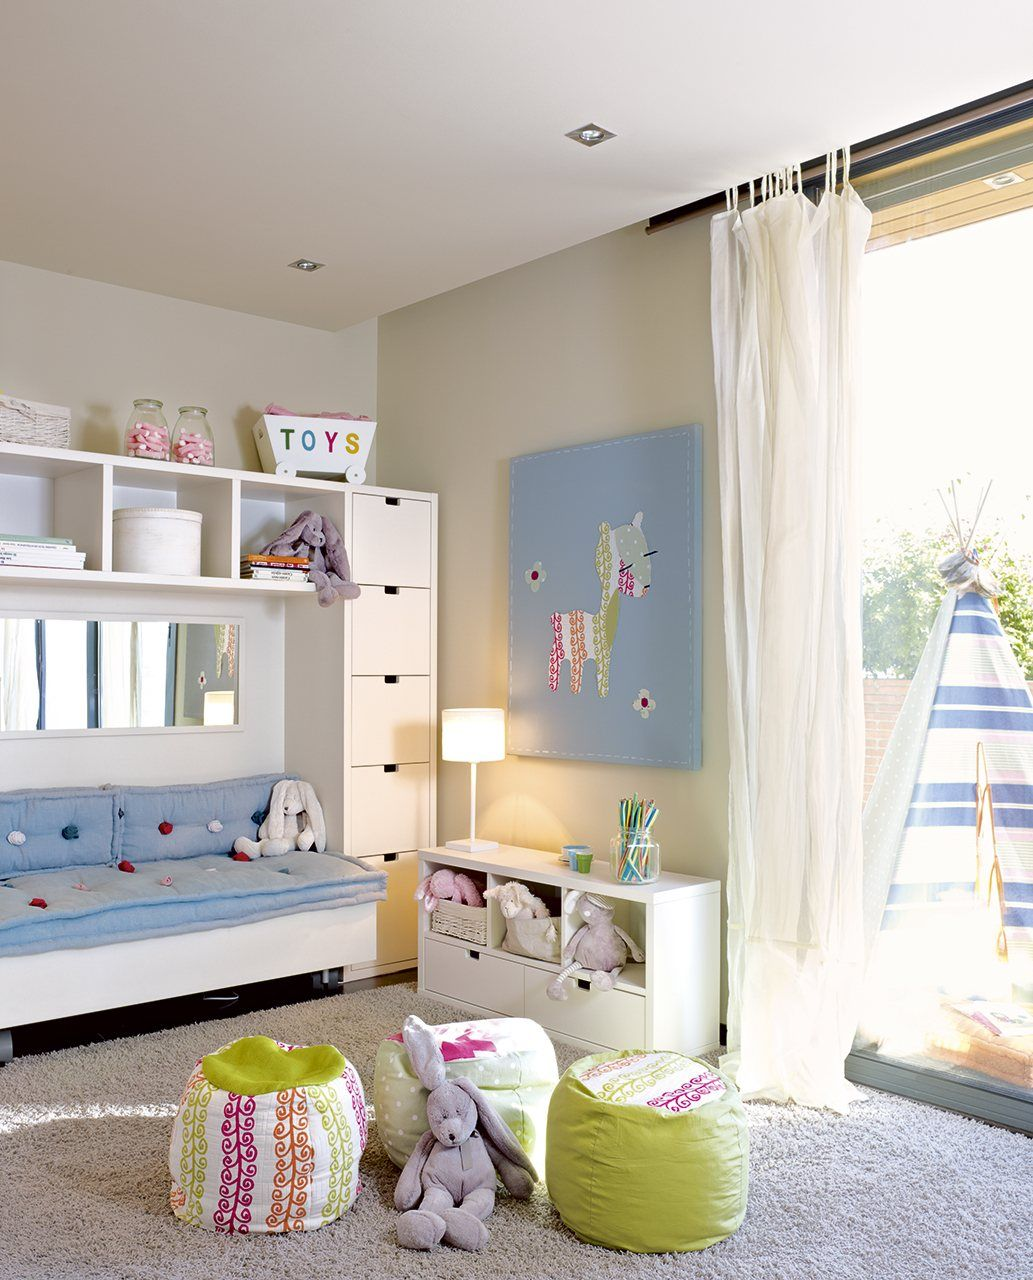 Las 5 claves para mantener en orden la habitaci n infantil for Bona nit muebles